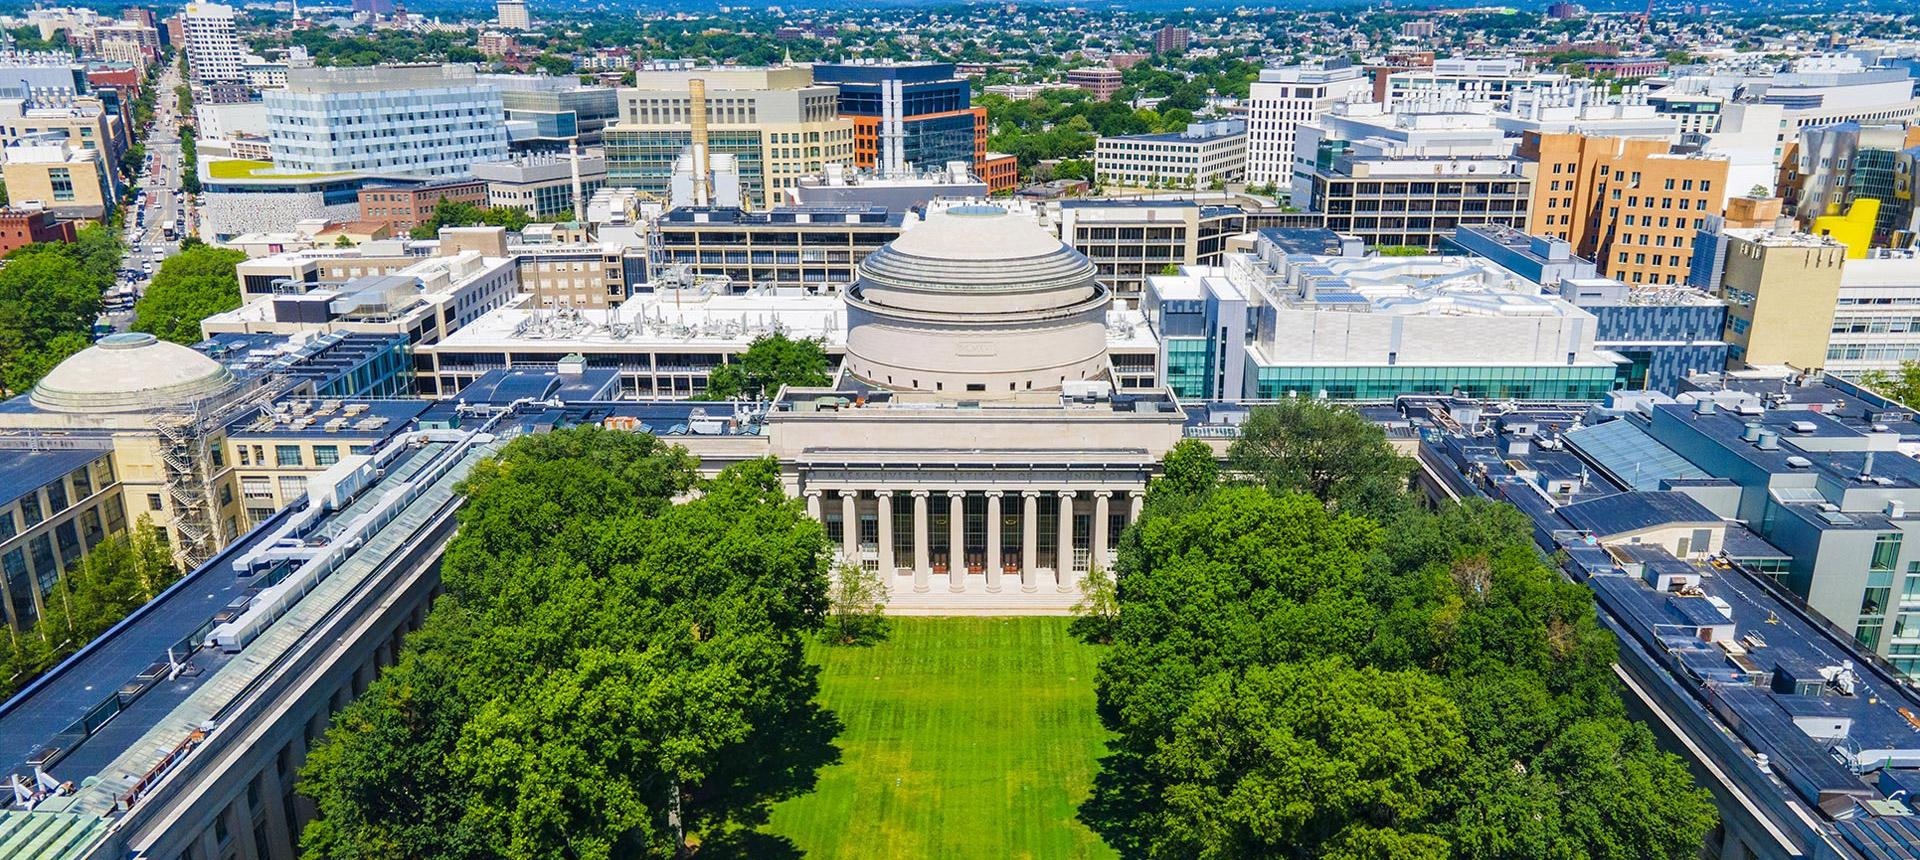 MIT's dome